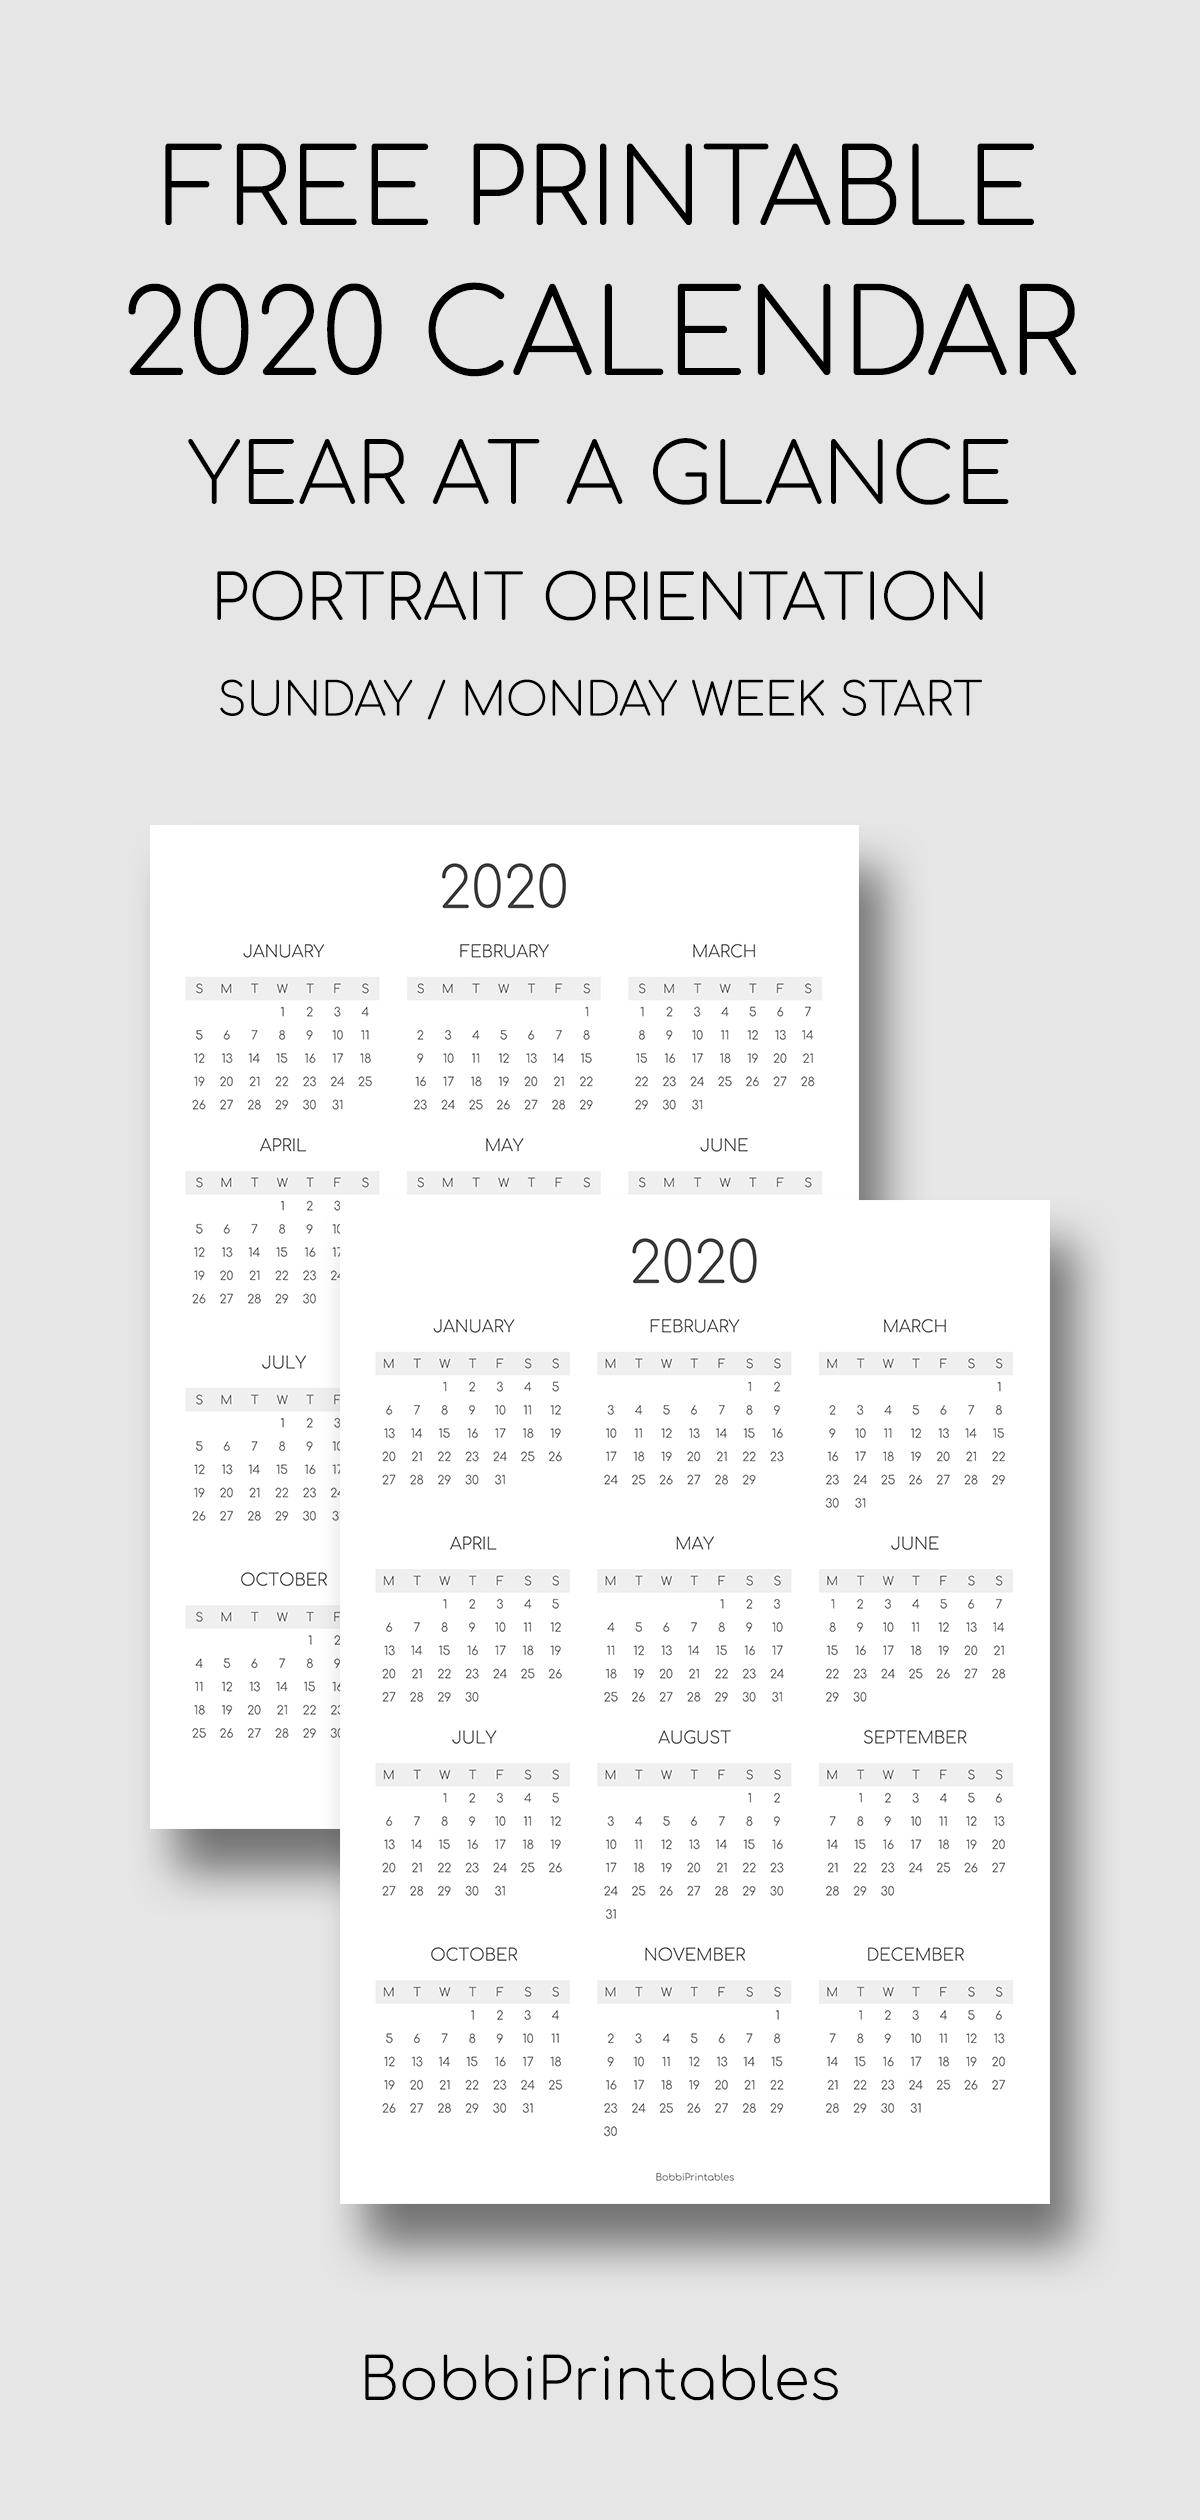 Printable 2020 Calendar - Portrait | At A Glance Calendar in Year At A Glance 2020 Printable Calendar